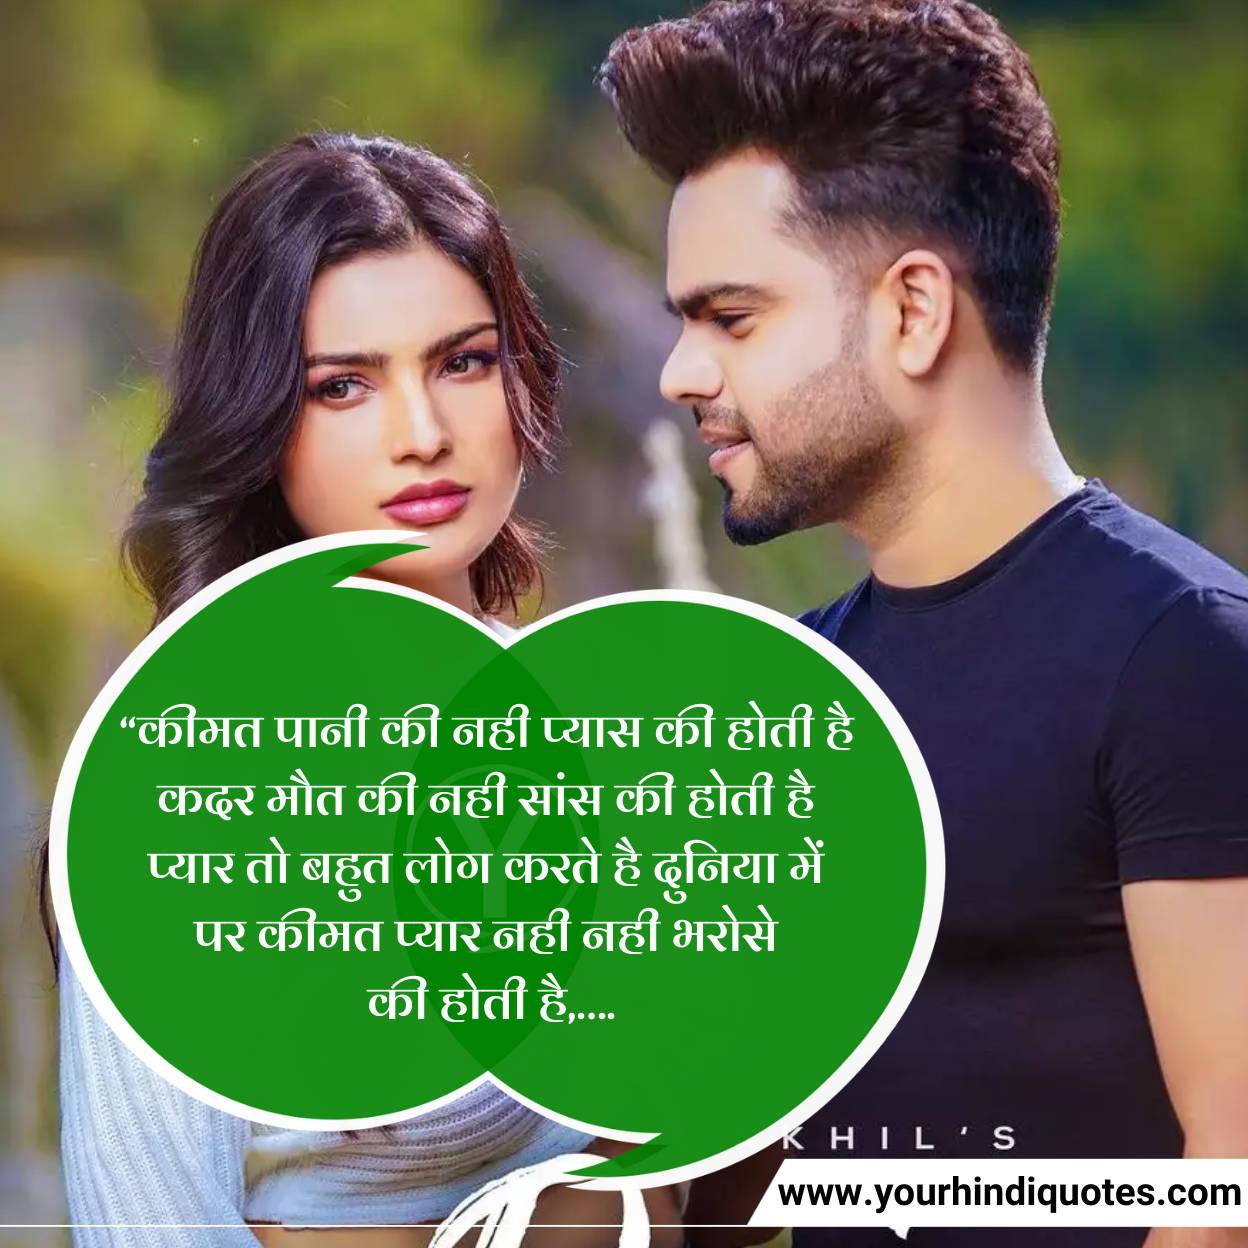 True Pyar Ki Shayari Hindi Images